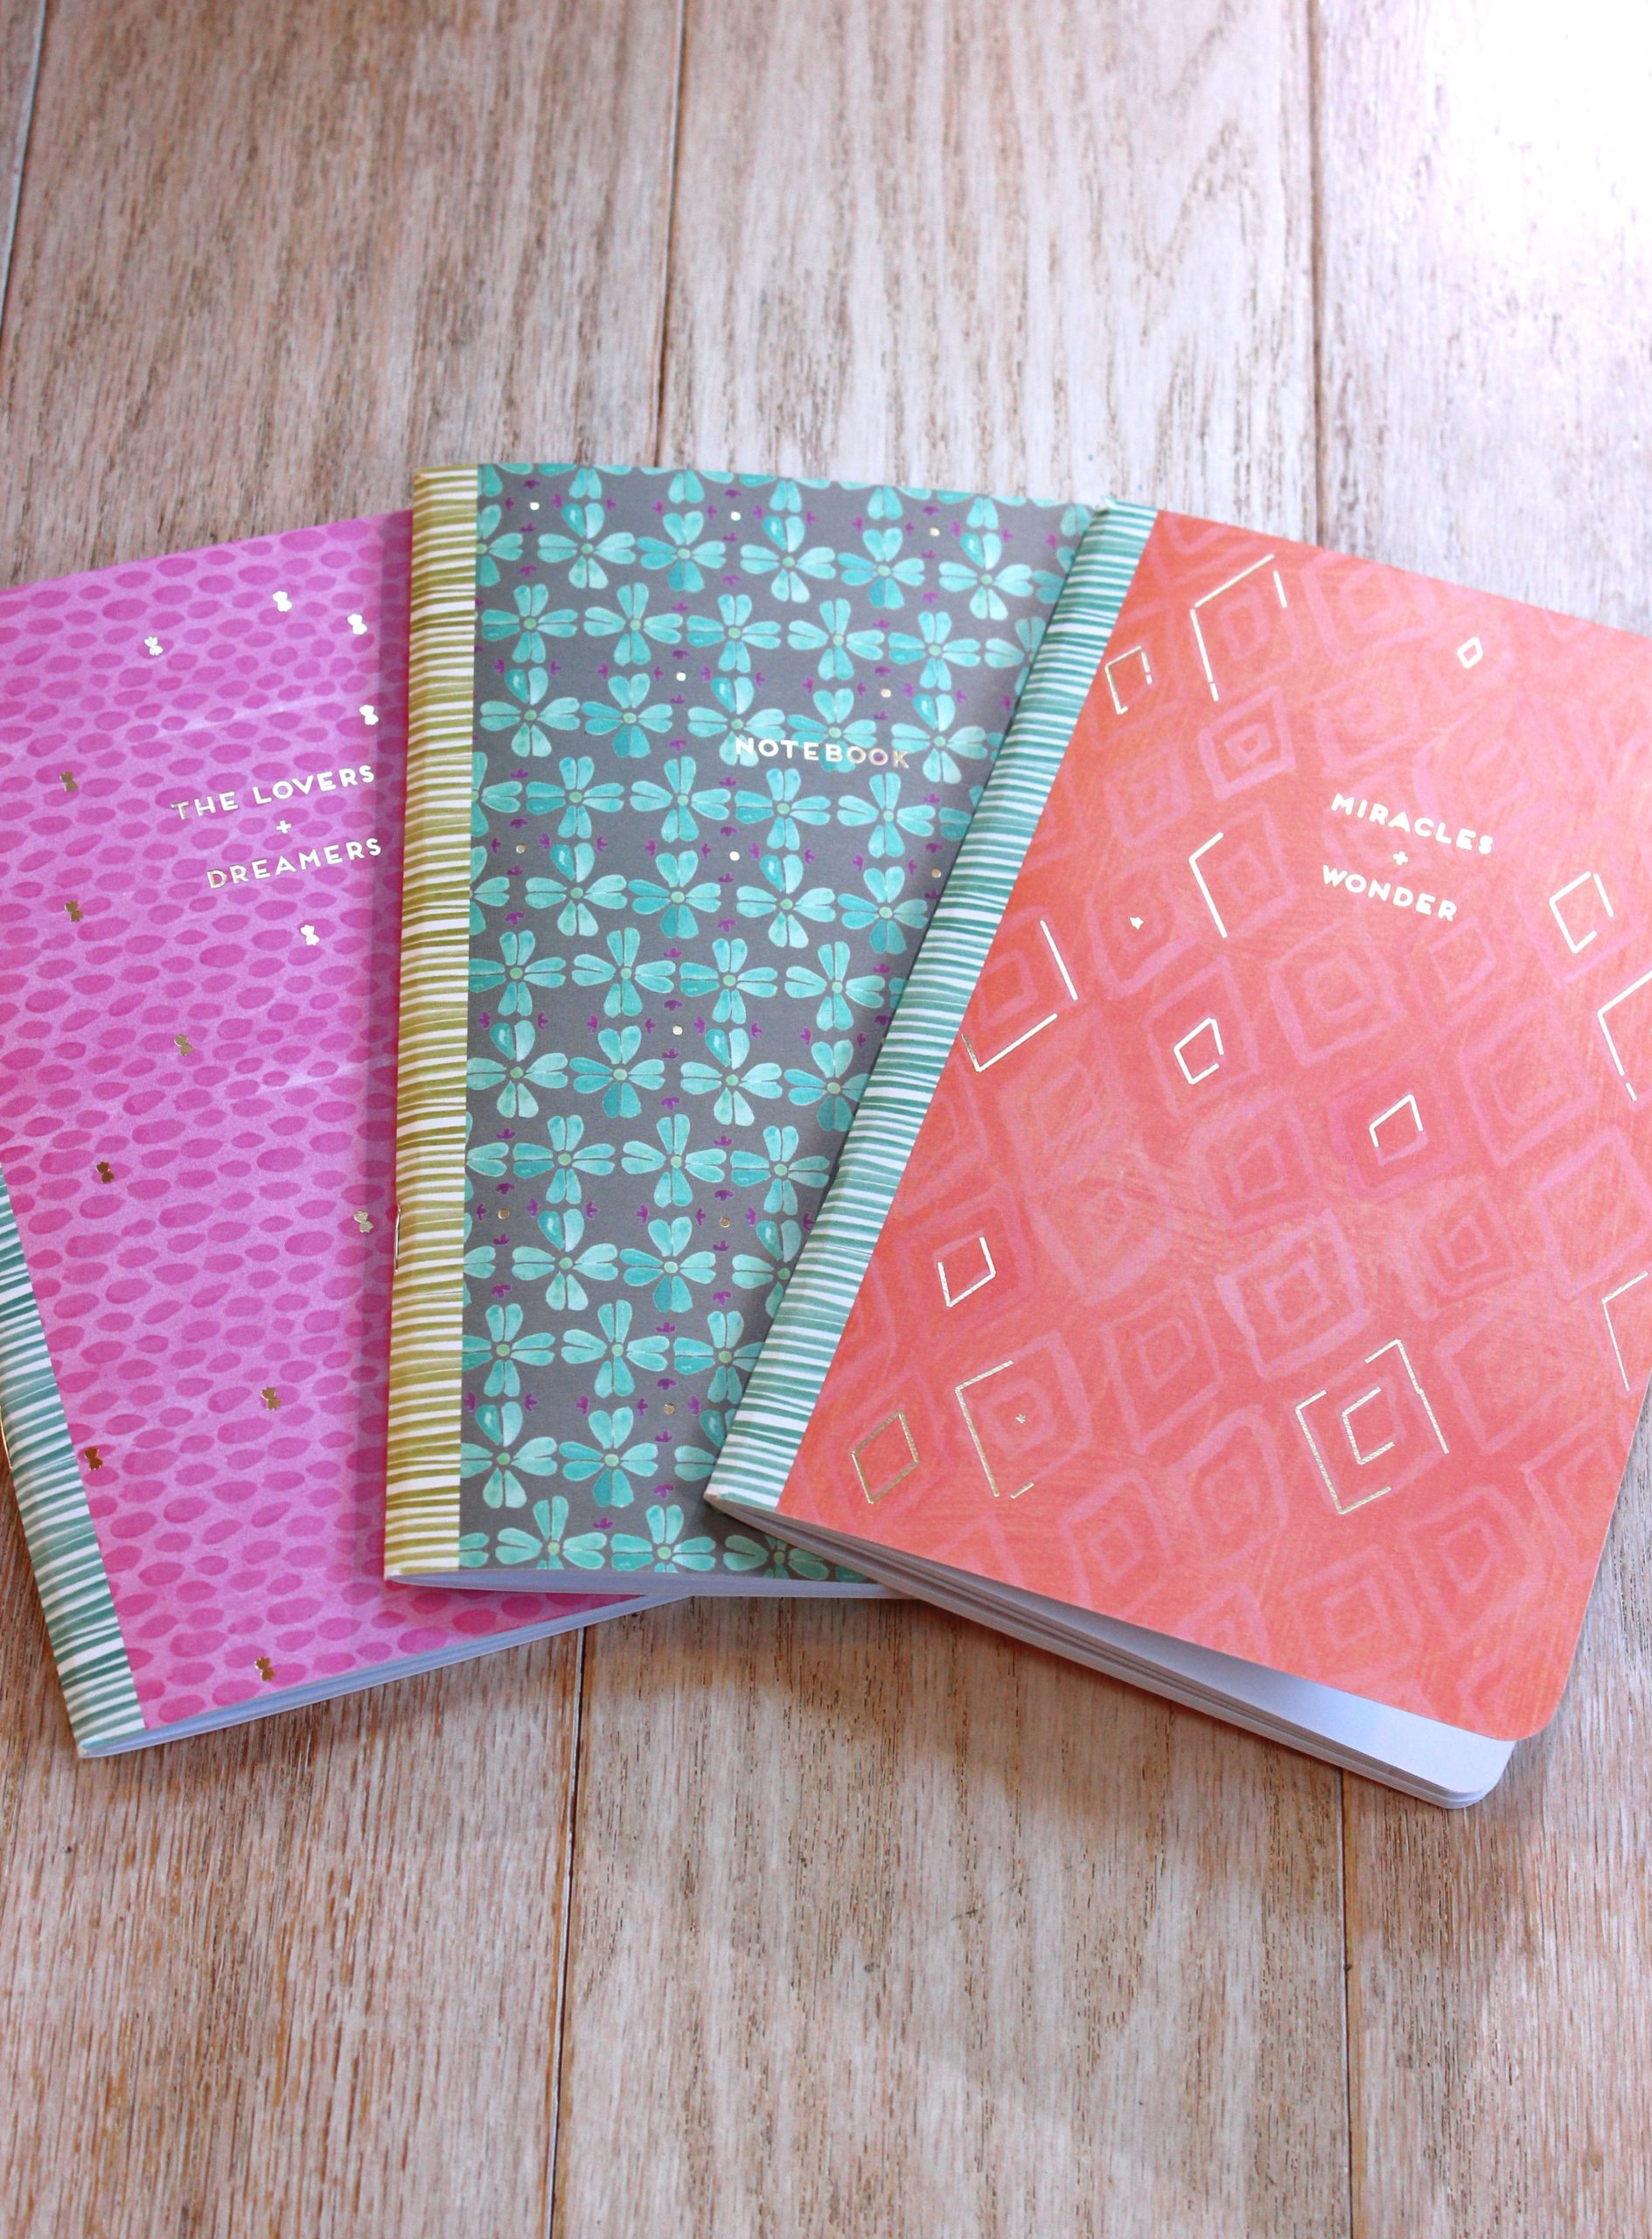 Miracles & Wonder Notebook